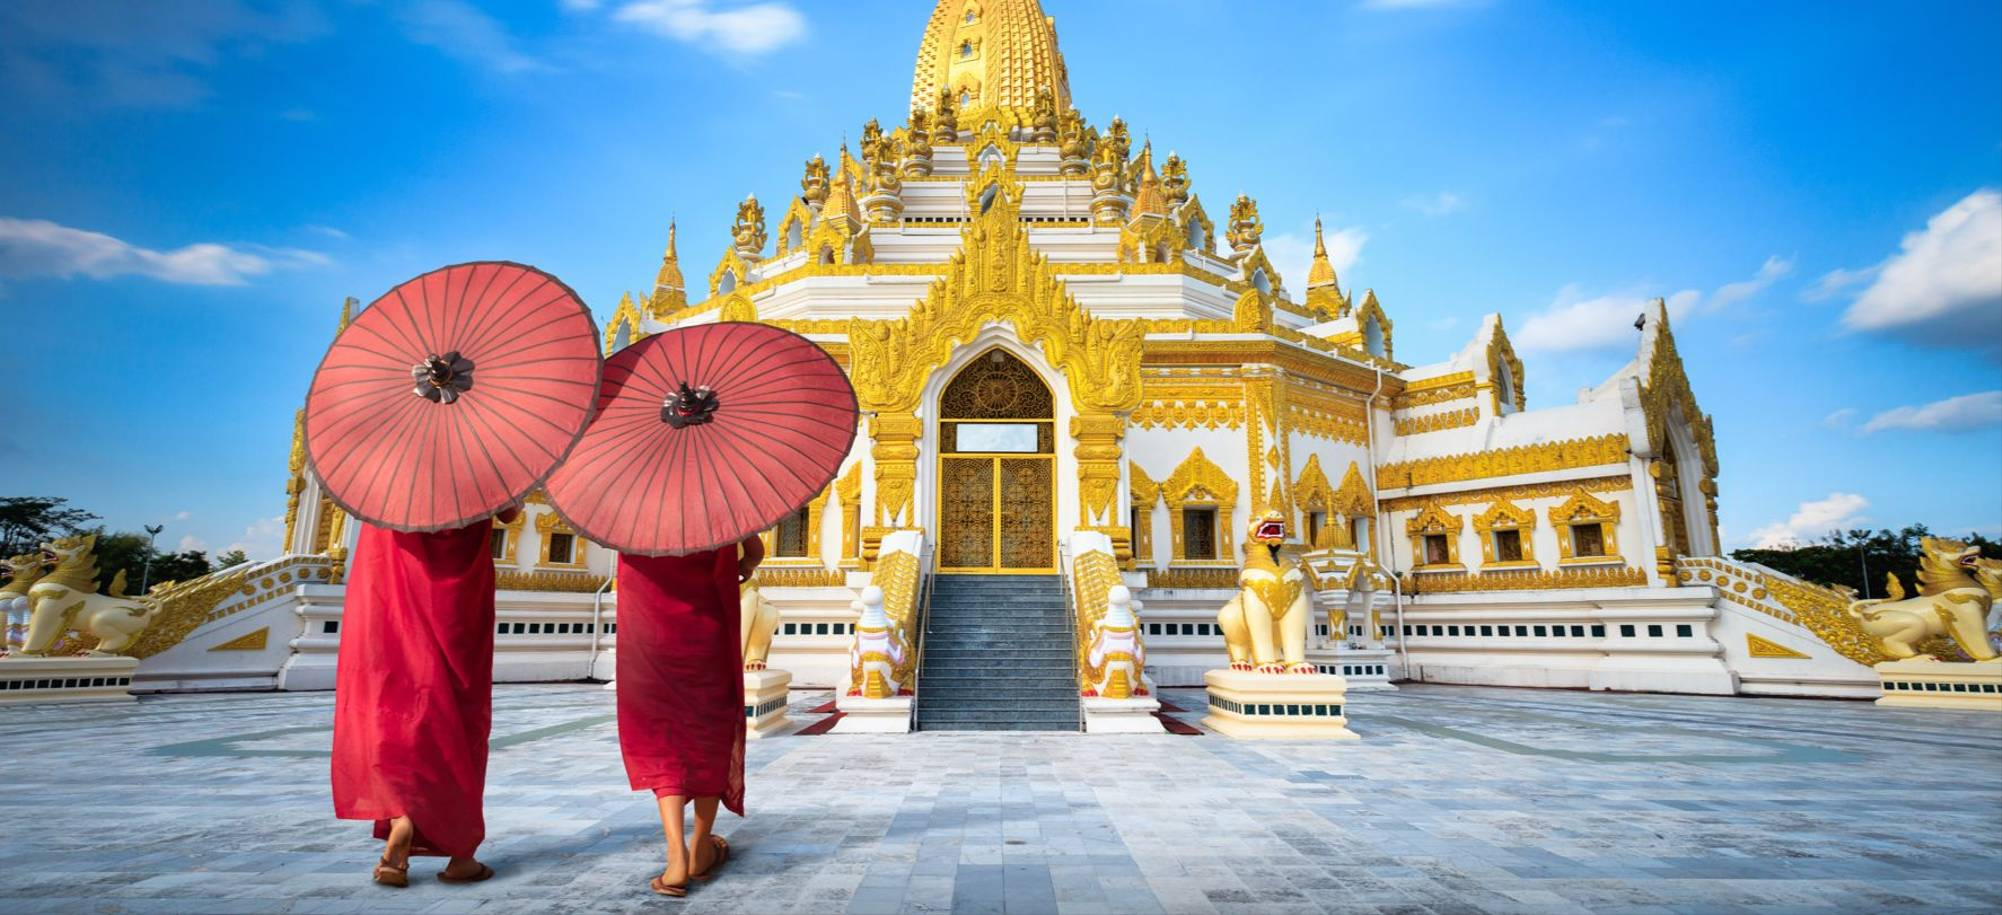 Yangon1   Monks   Itinerary Desktop